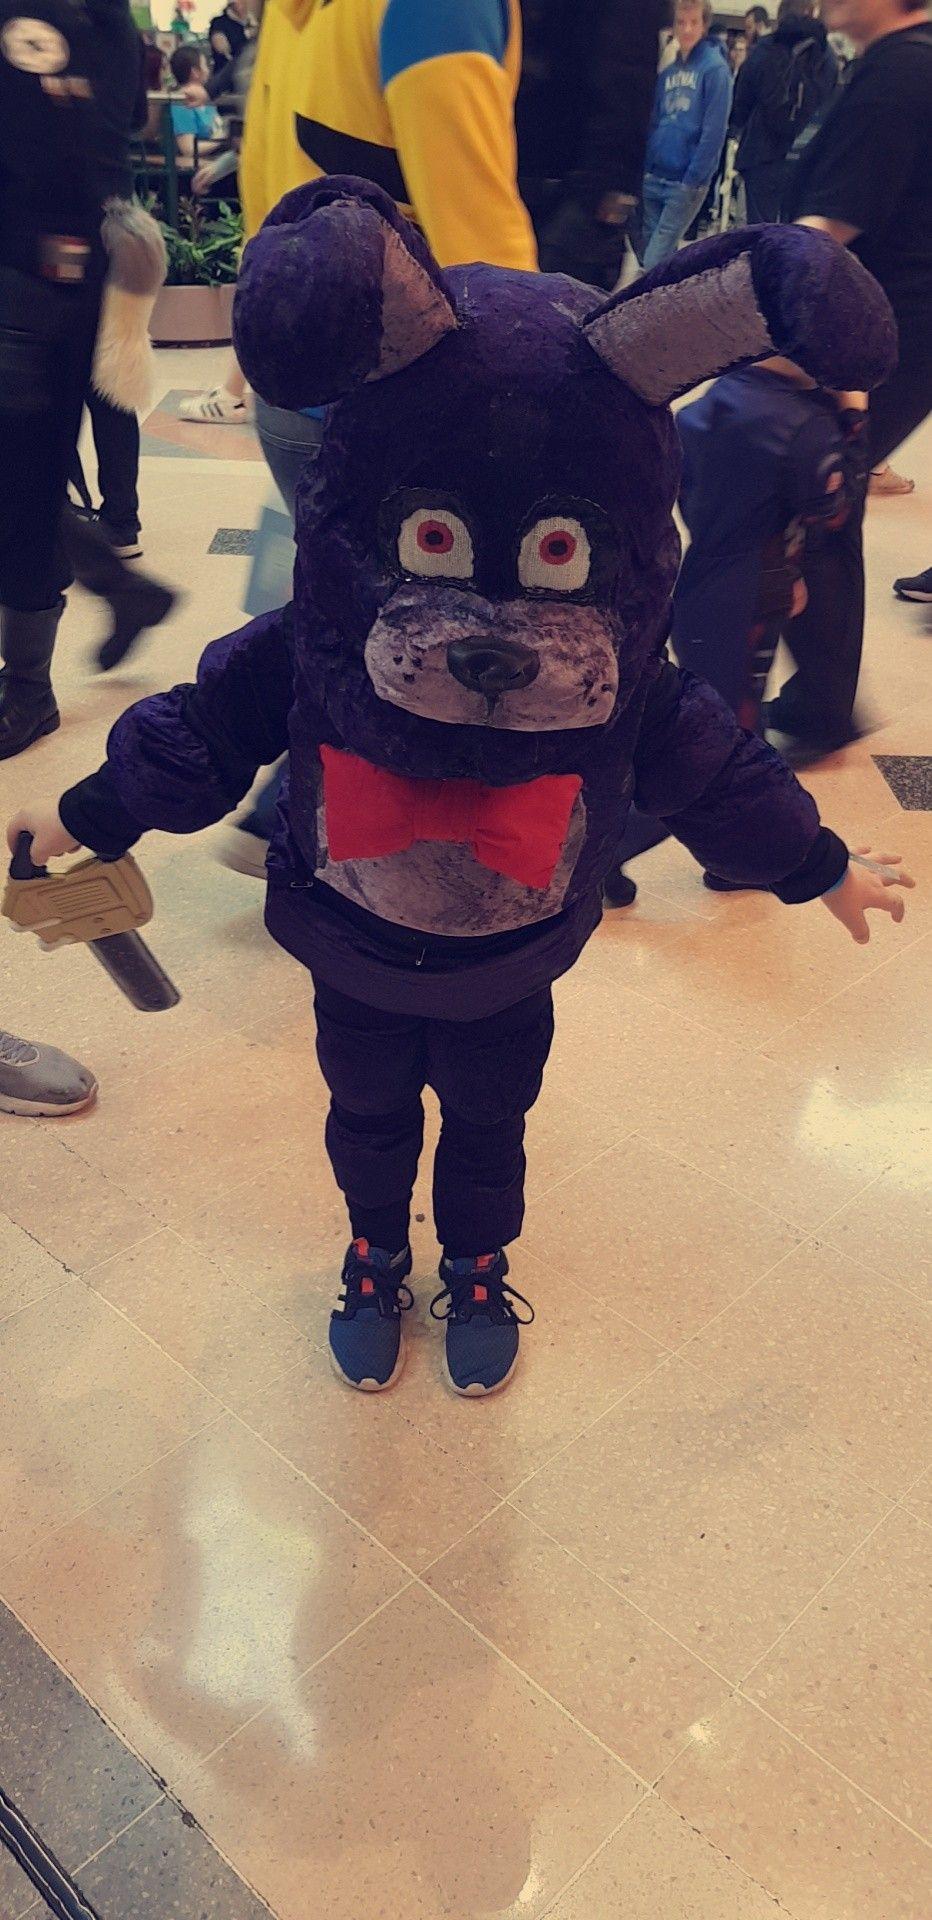 Child bonnie cosplay fnaf costume by _theleia instagram